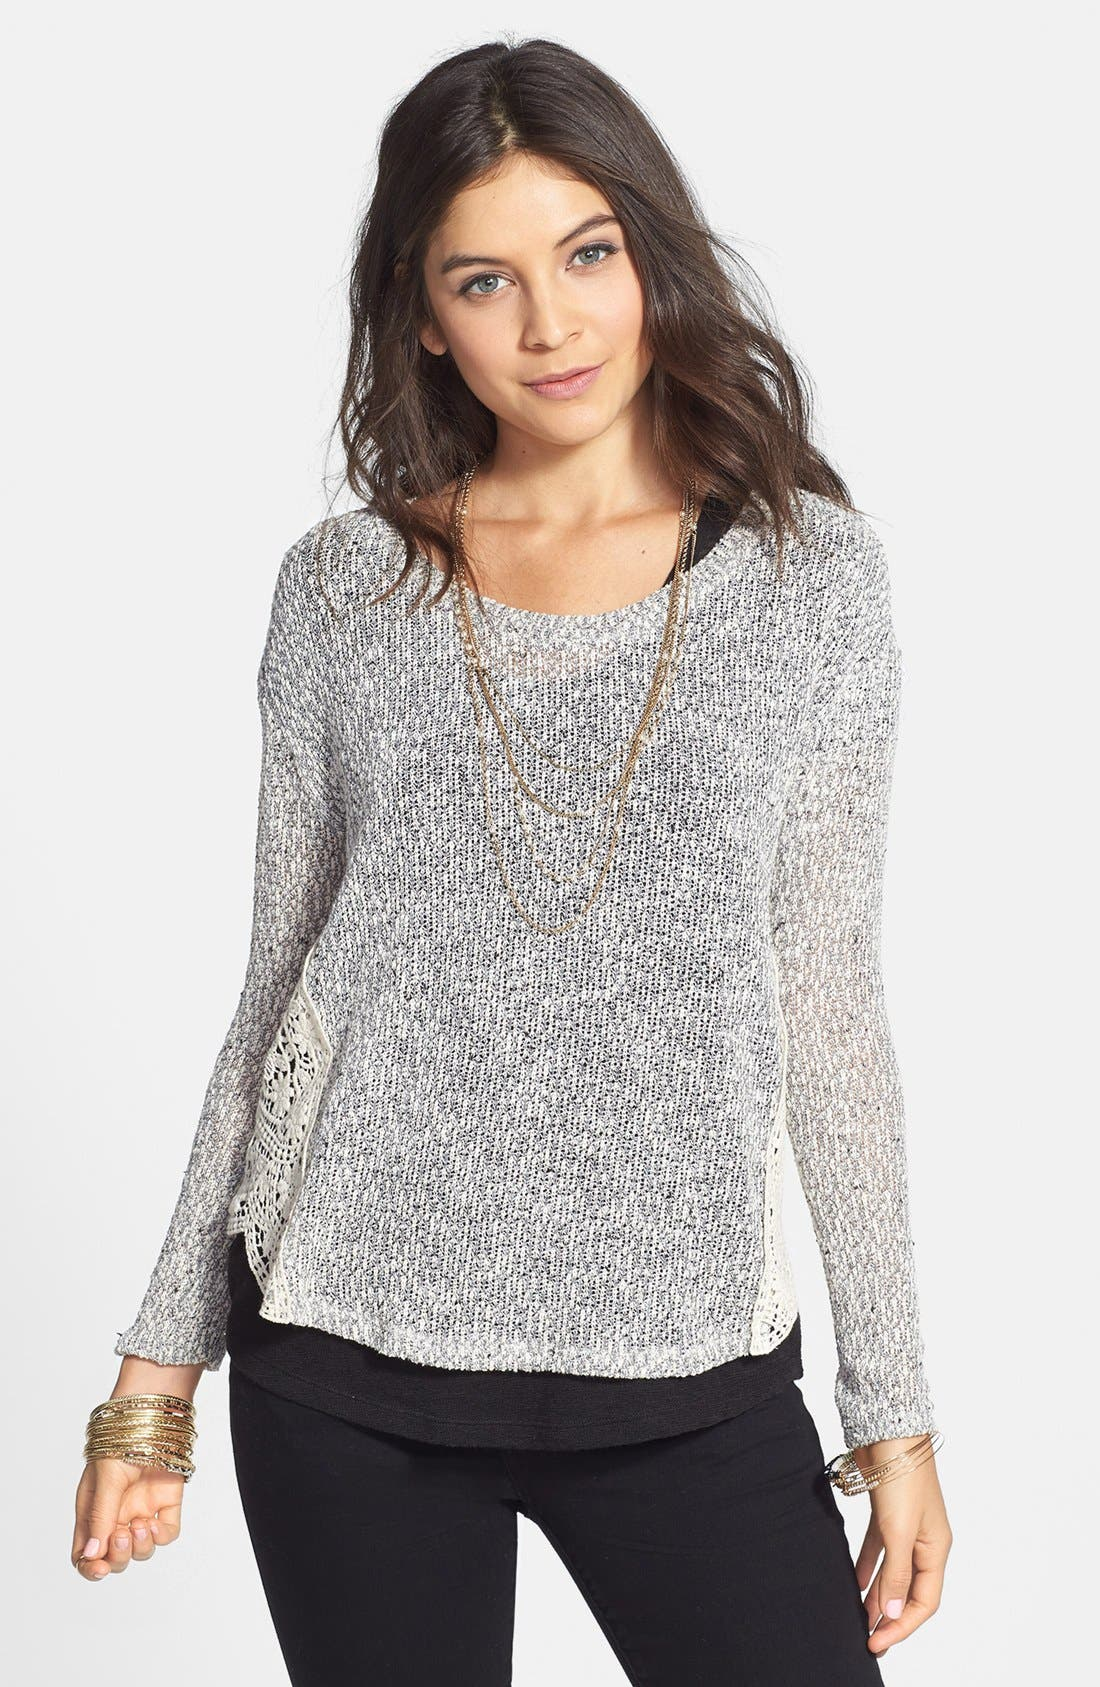 Alternate Image 1 Selected - Lush Crochet Side Marled Sweater (Juniors)